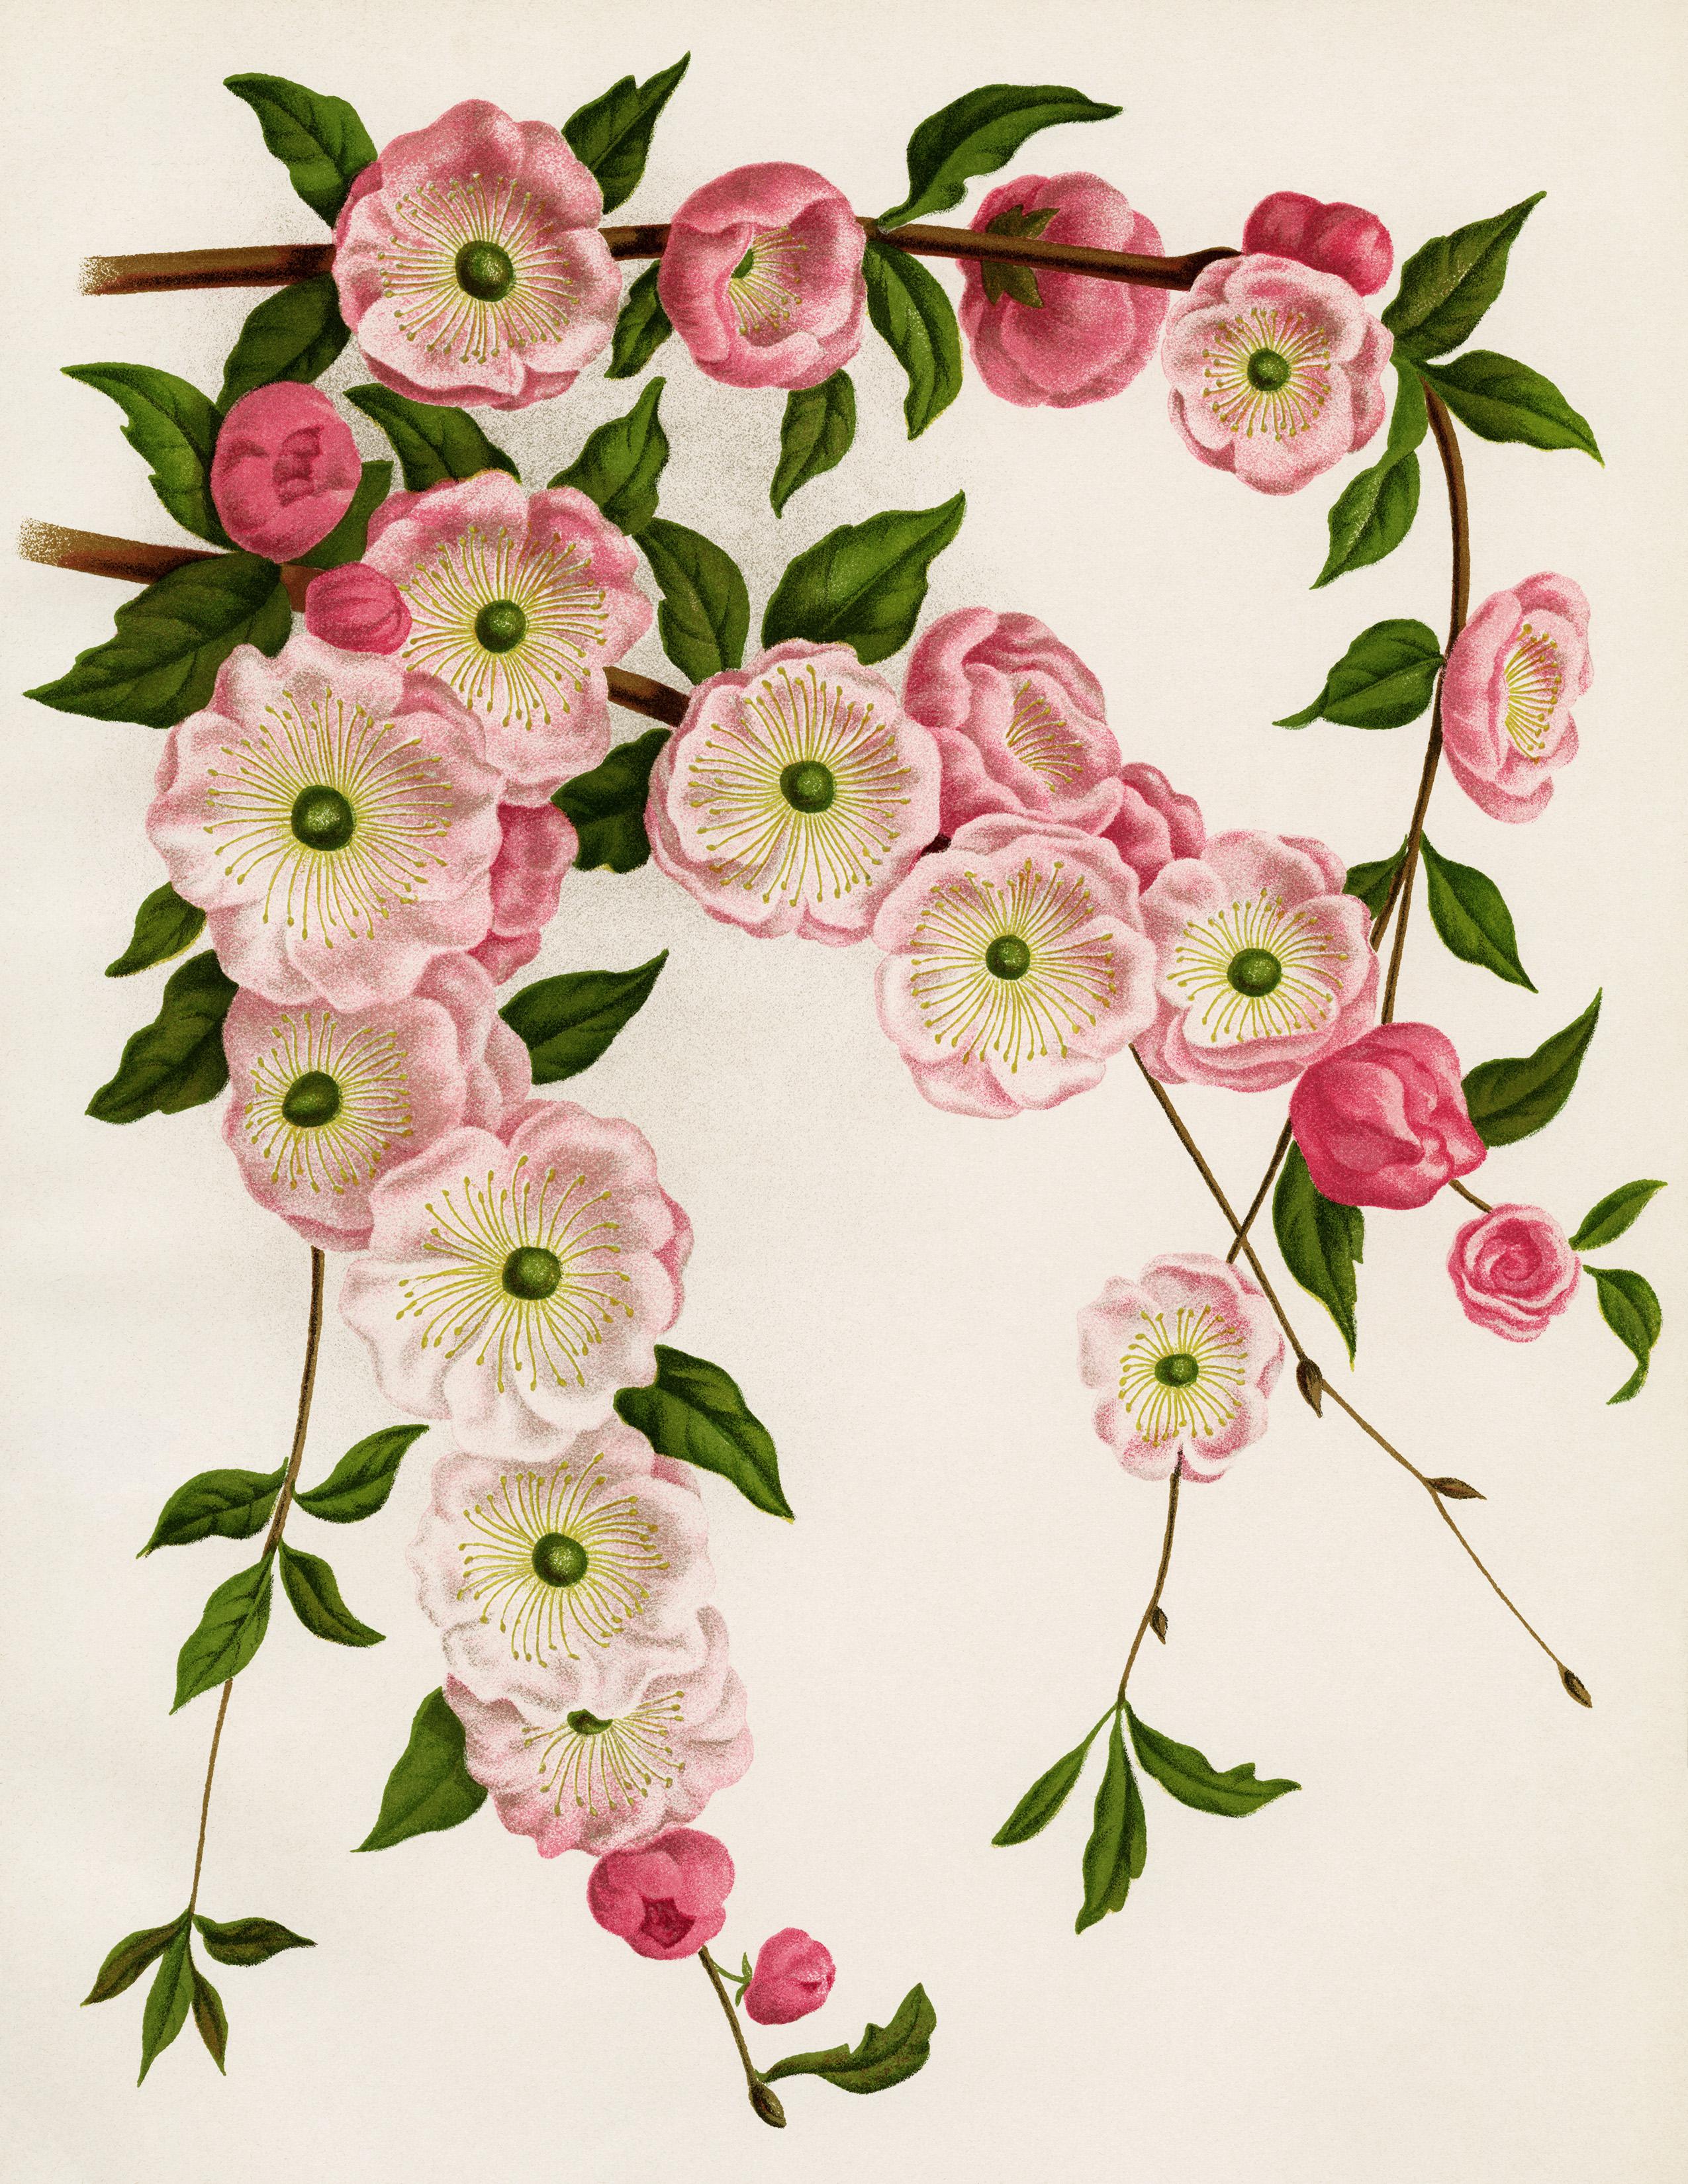 Flowering Almond Free Vintage Image